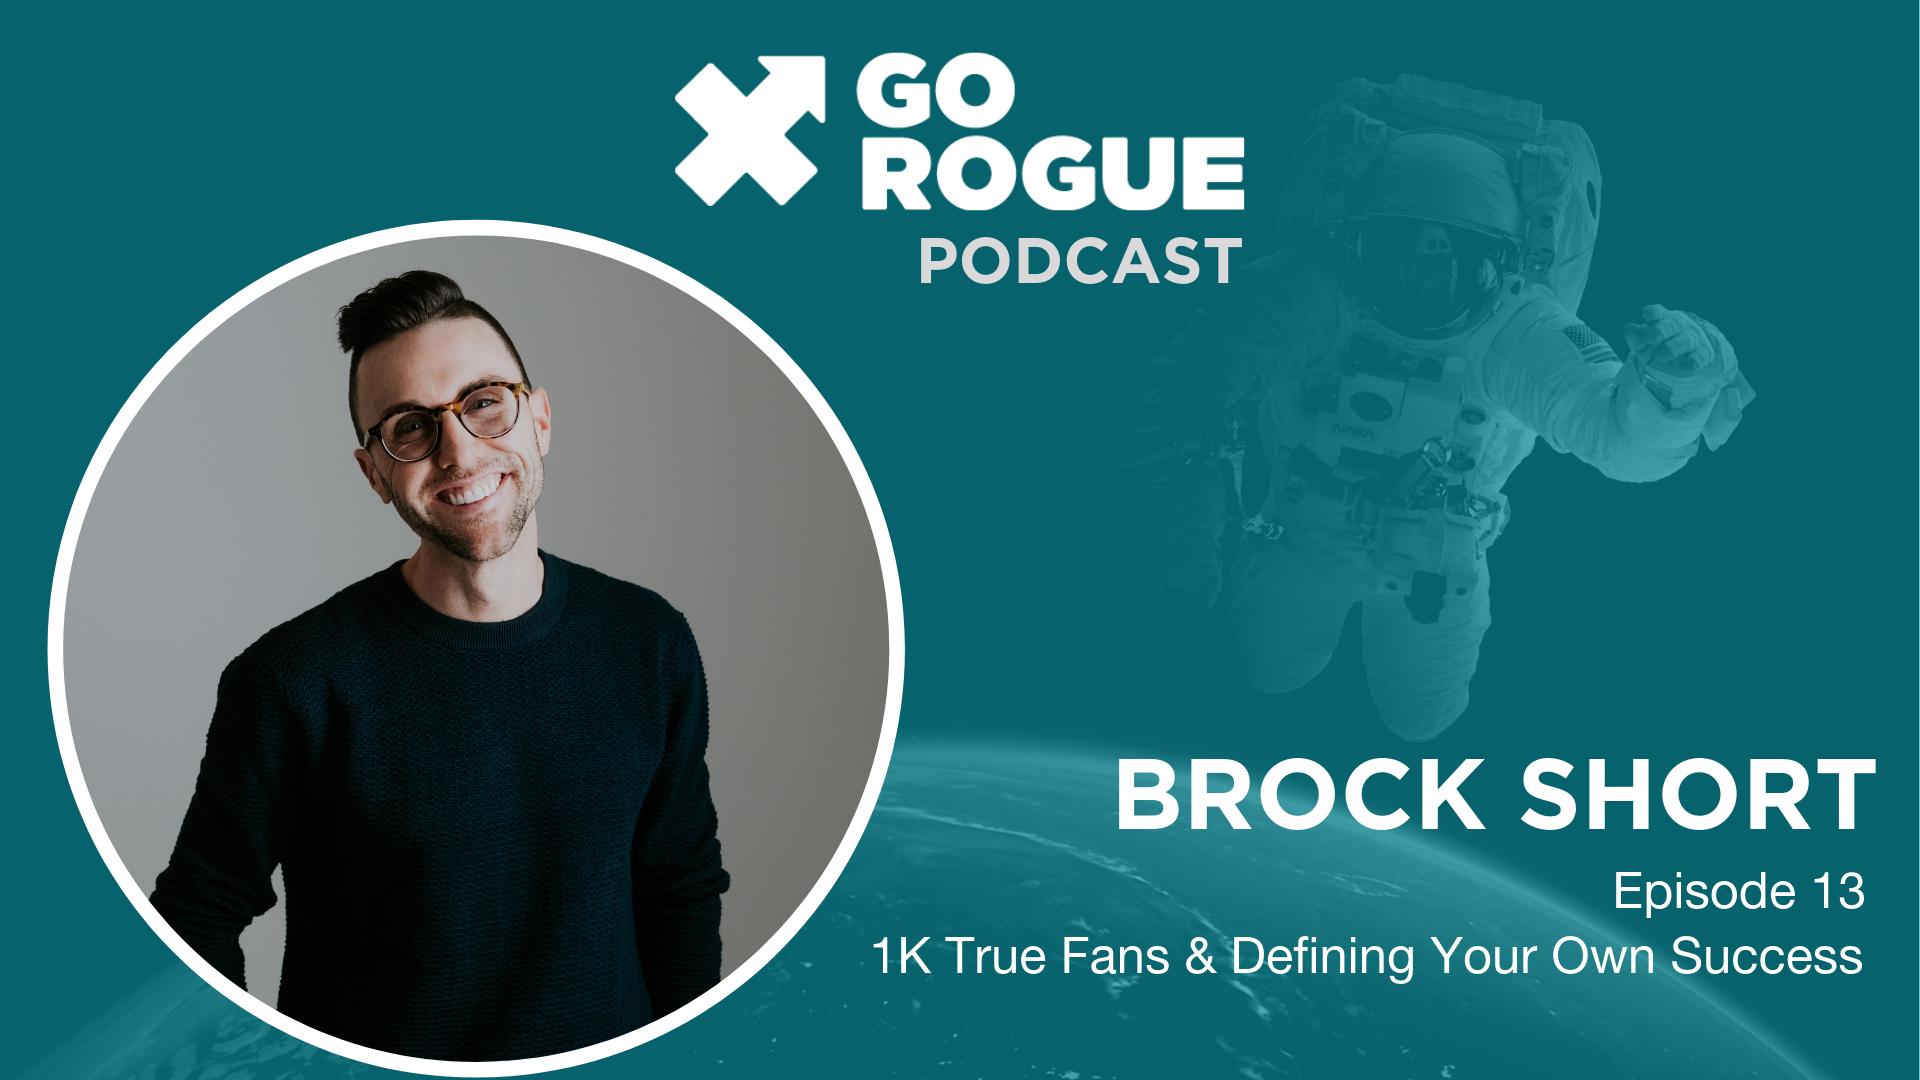 Brock blog 2.png